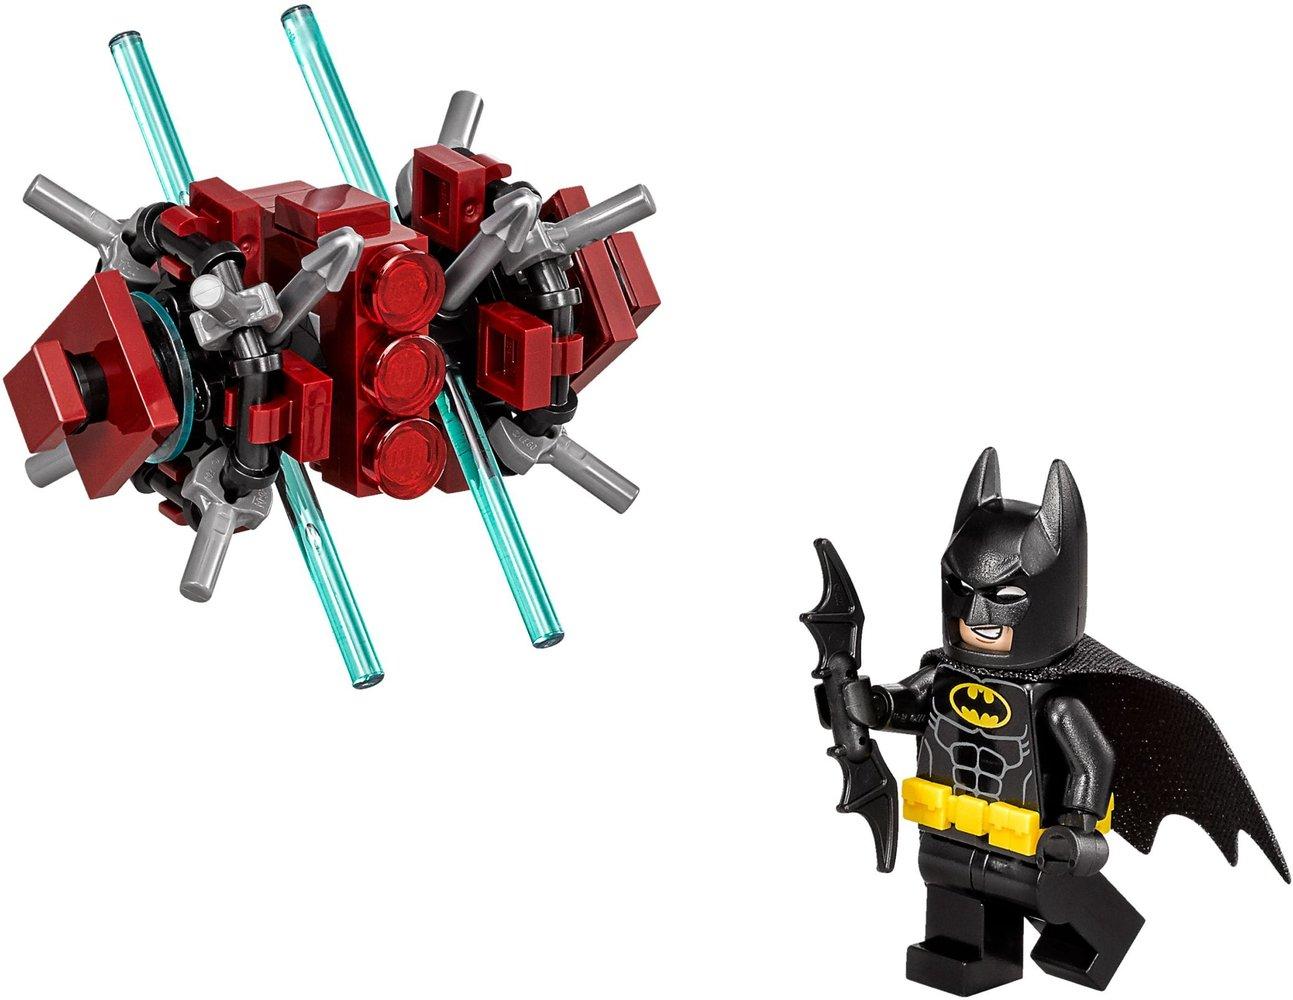 Batman in the Phantom Zone